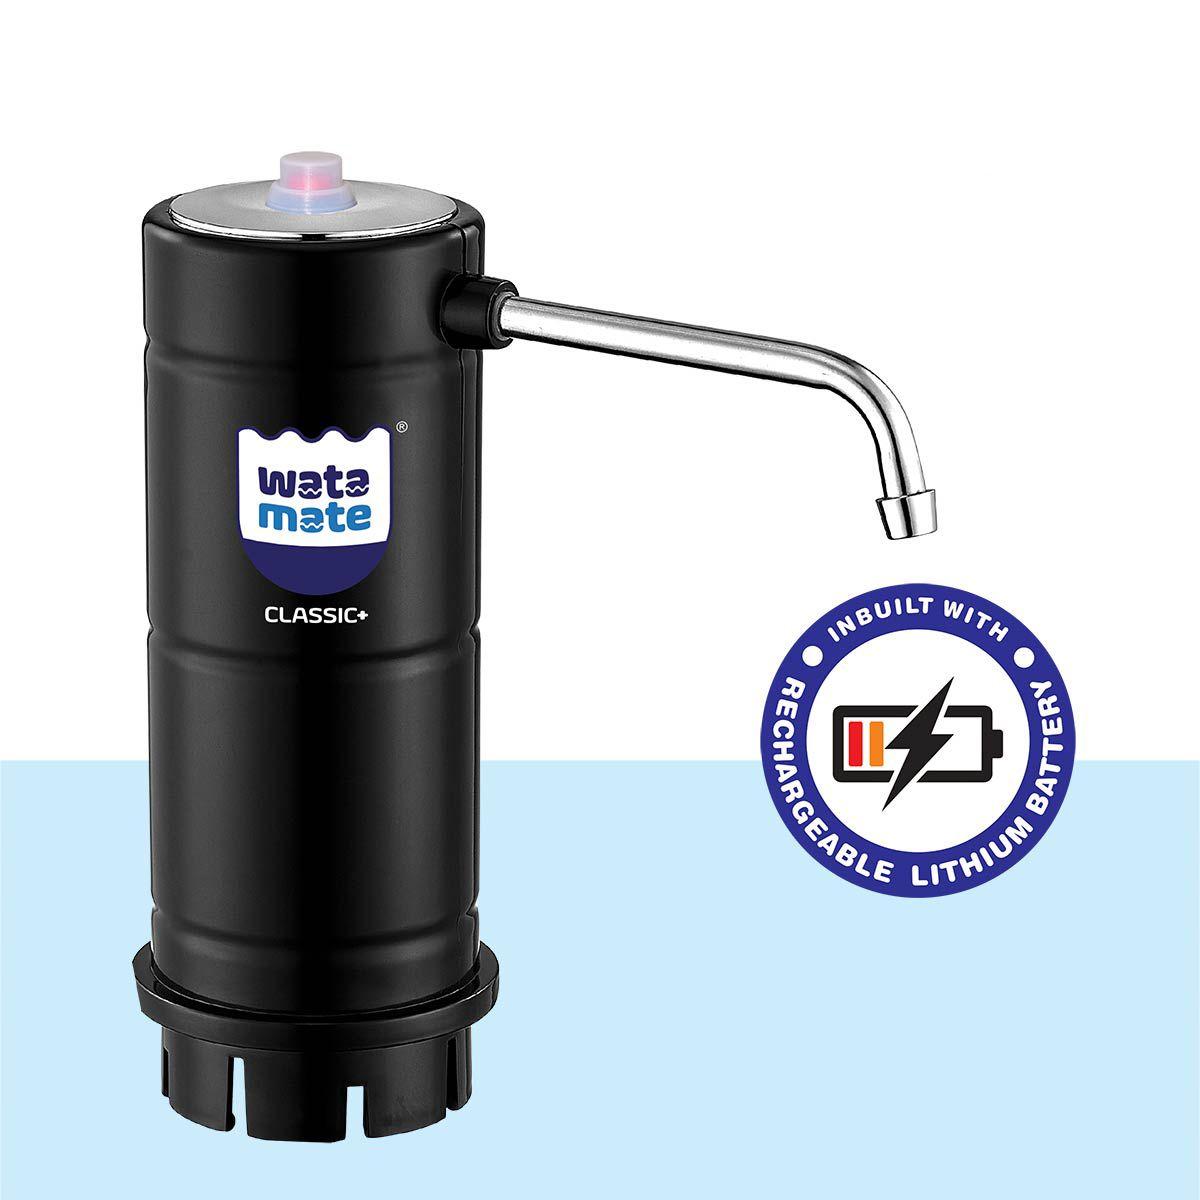 Watamate Classic+, Rechargeable Water Dispenser Pump - Black